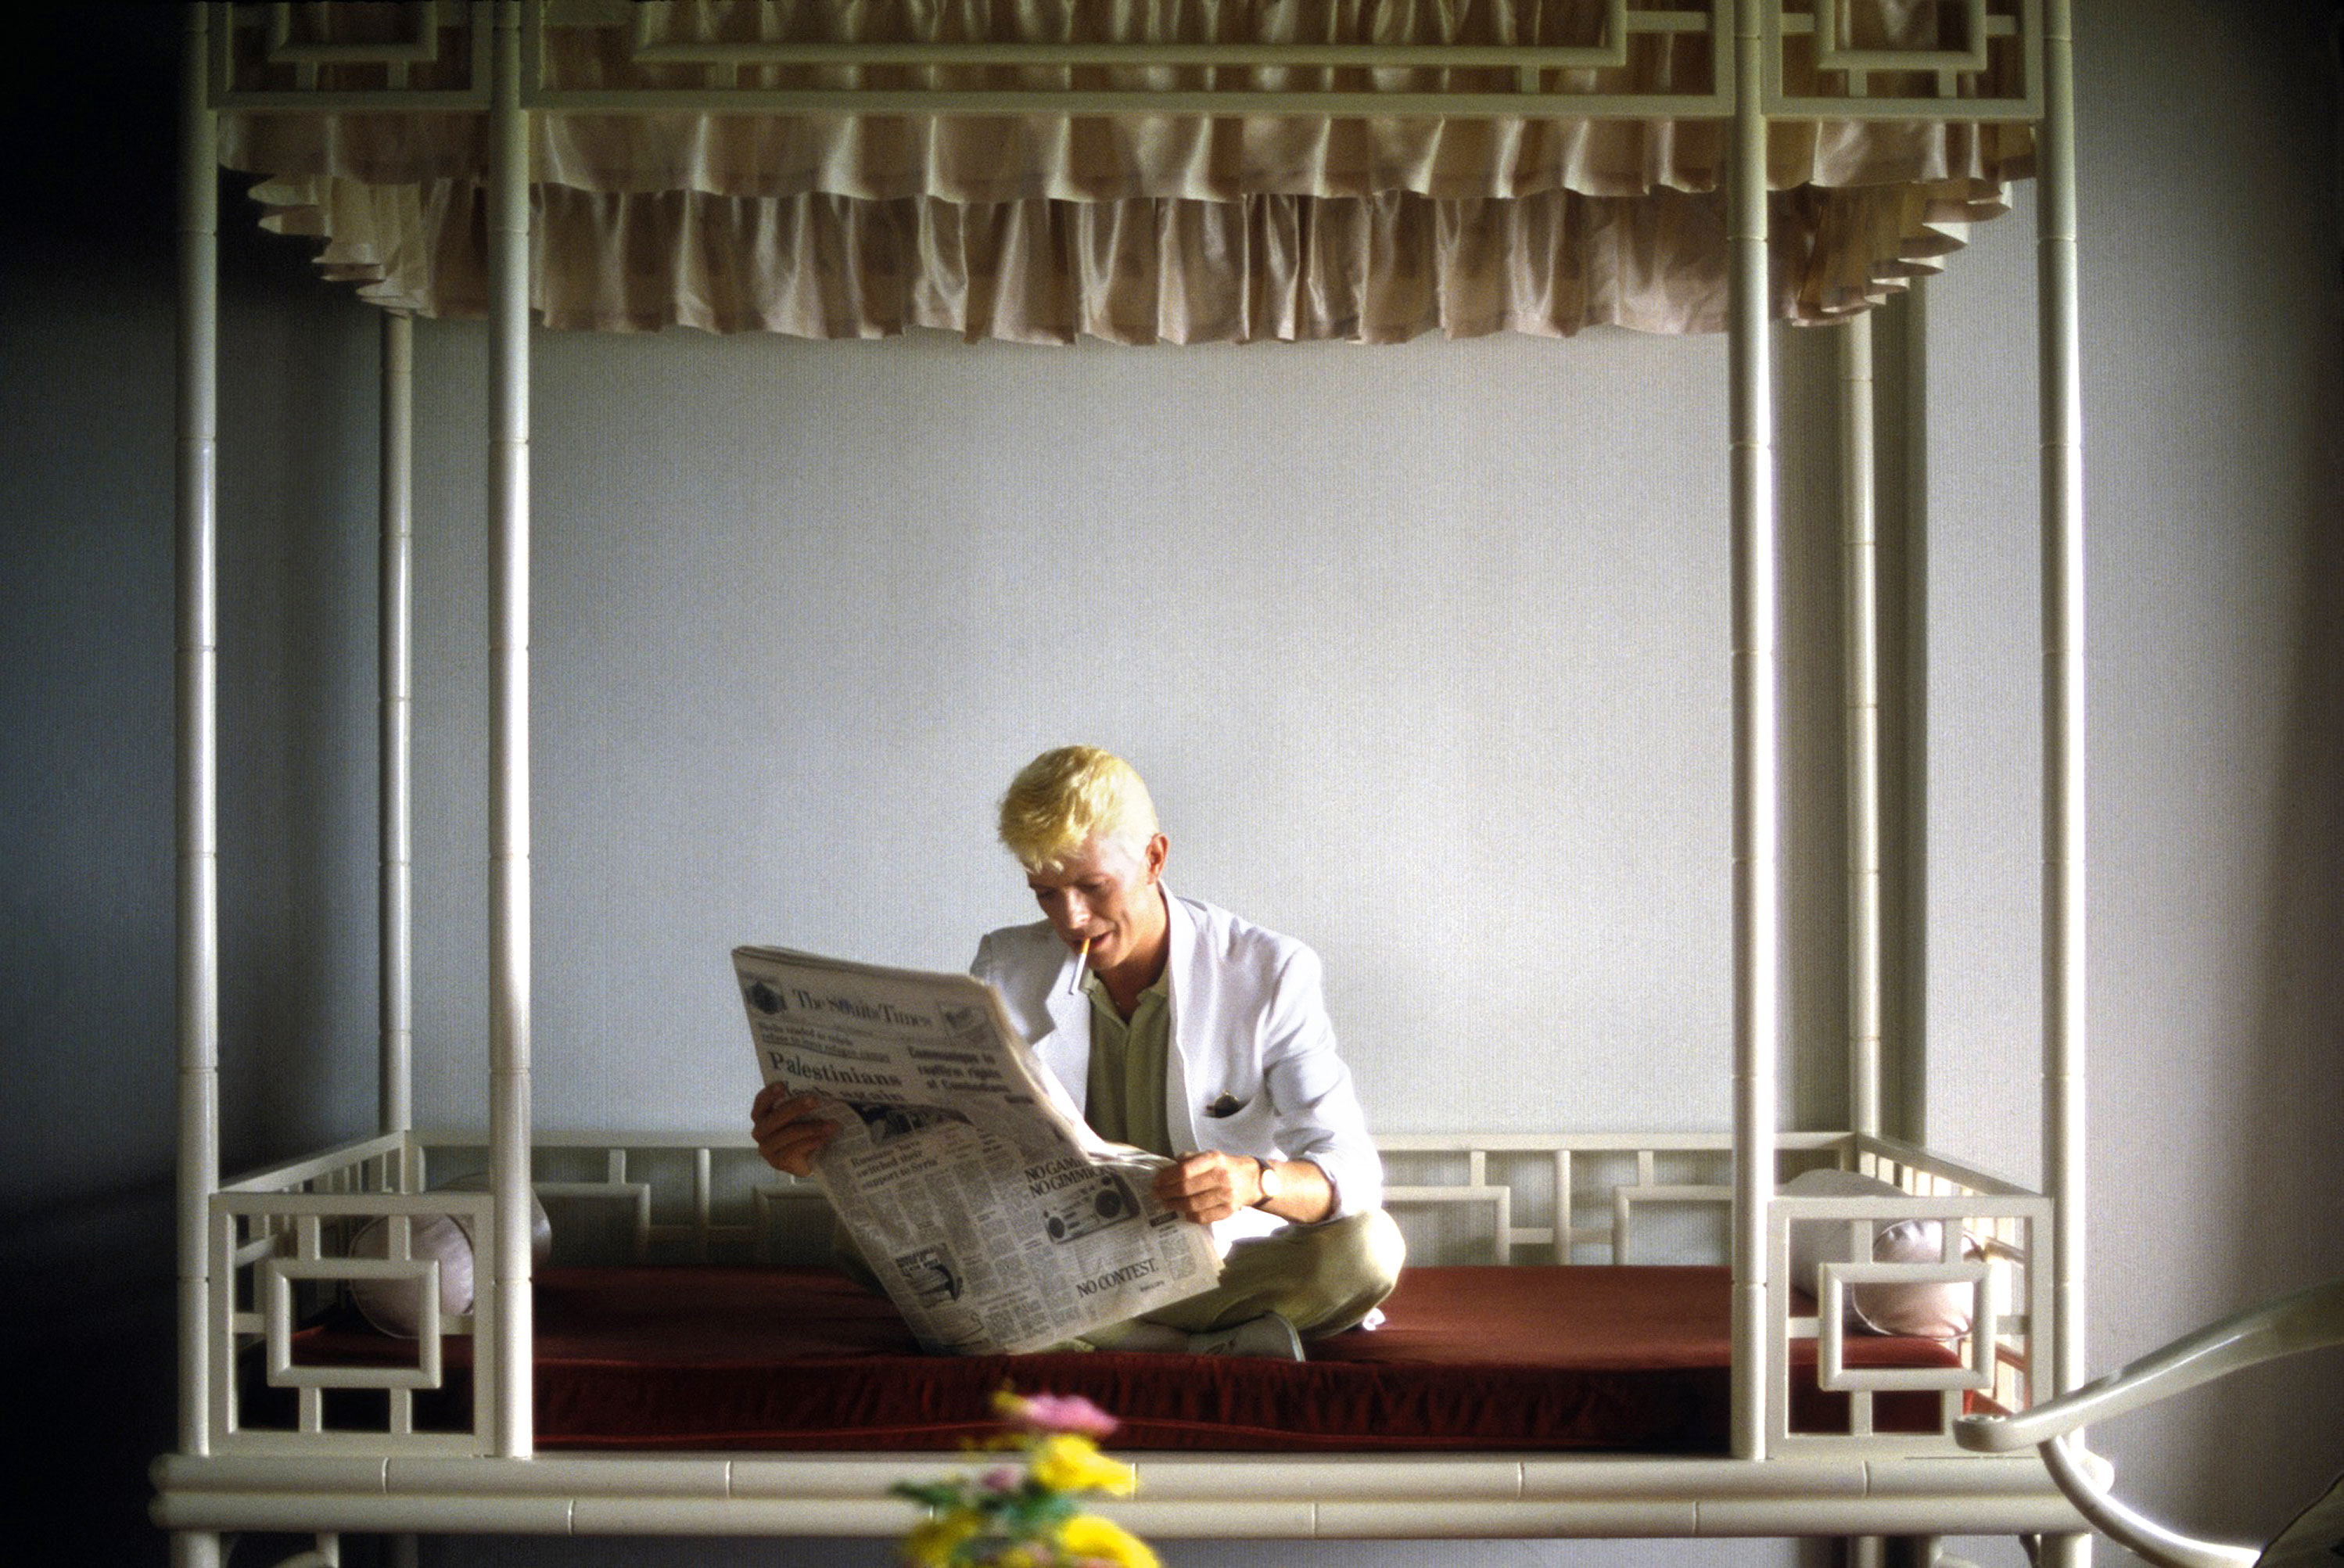 Дэвид Боуи читает свежий номер газеты The Straits Times, Гонконг, 1983